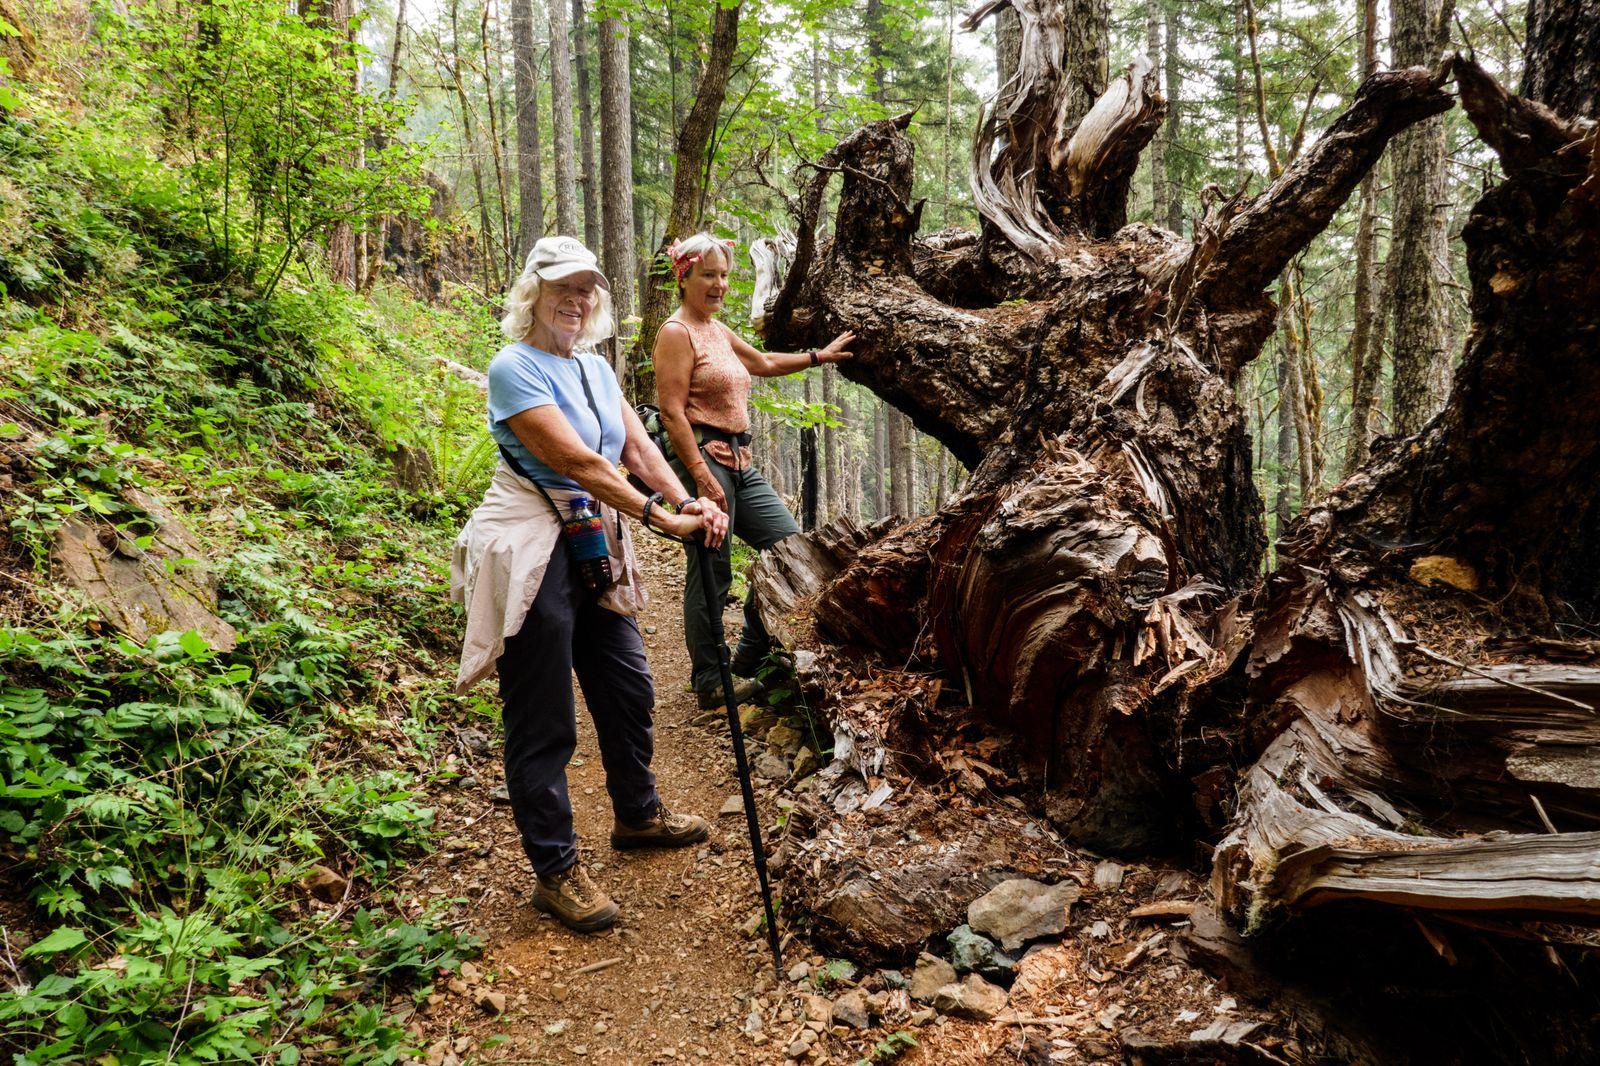 June and Shirley admire Mother Nature's garden art